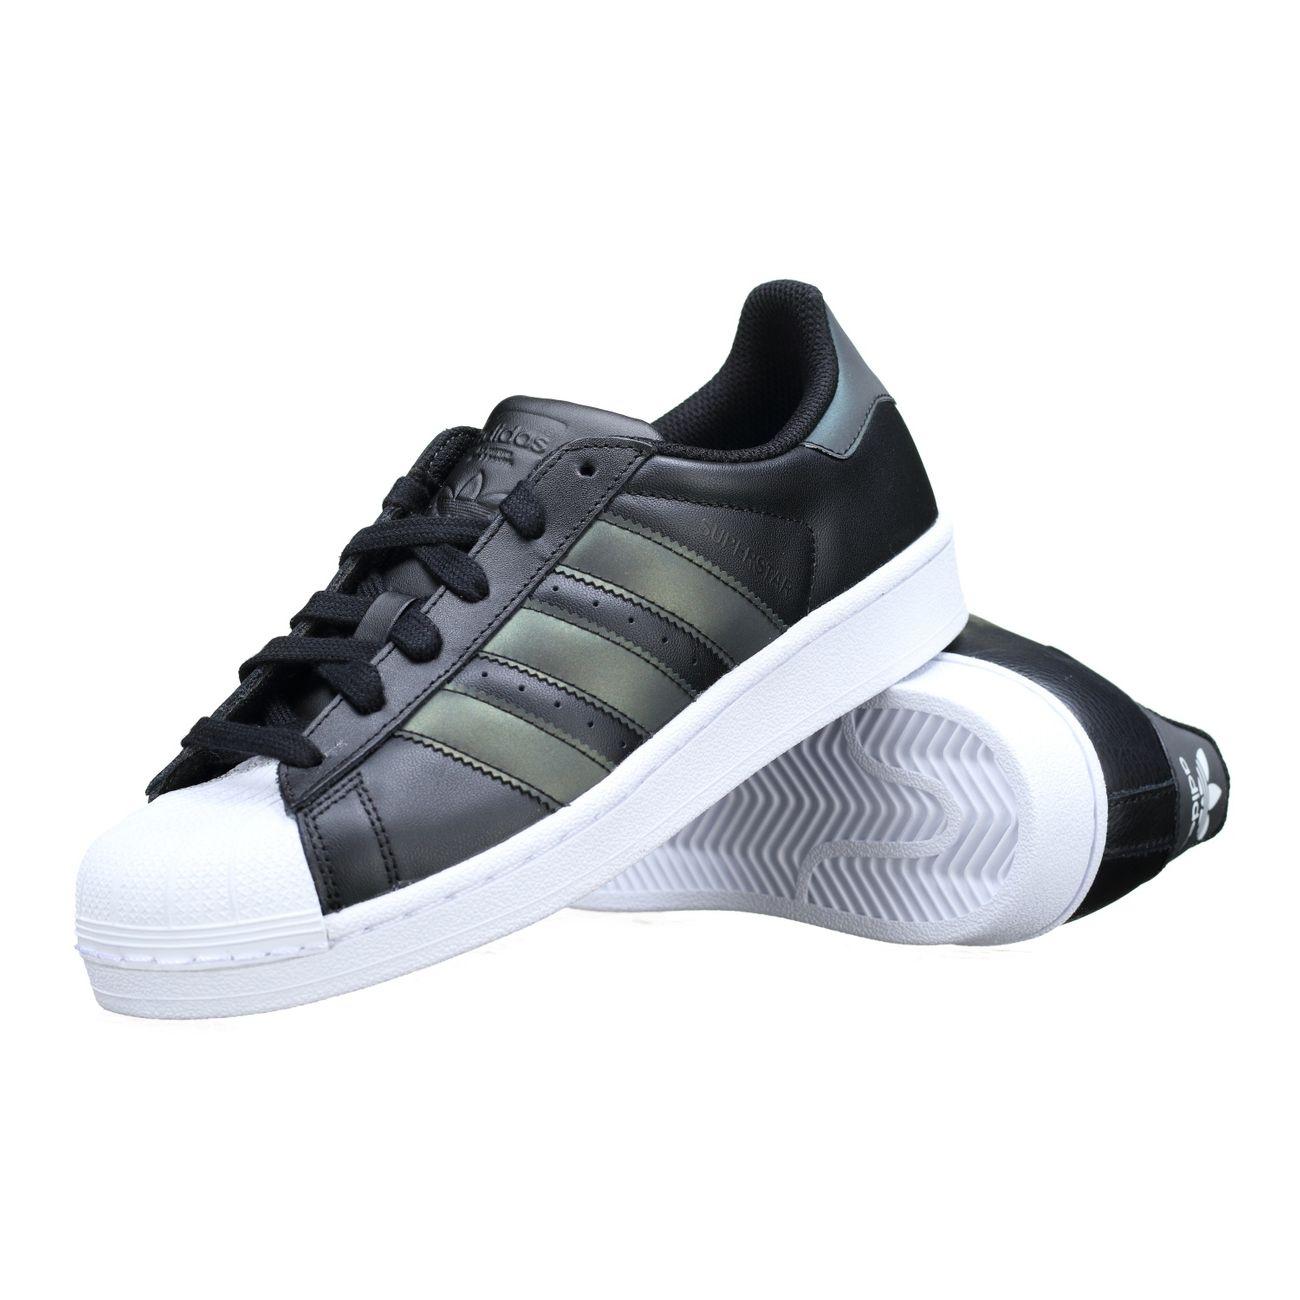 Mode- Lifestyle homme ADIDAS Basket Adidas Superstar J Cq2688 Black